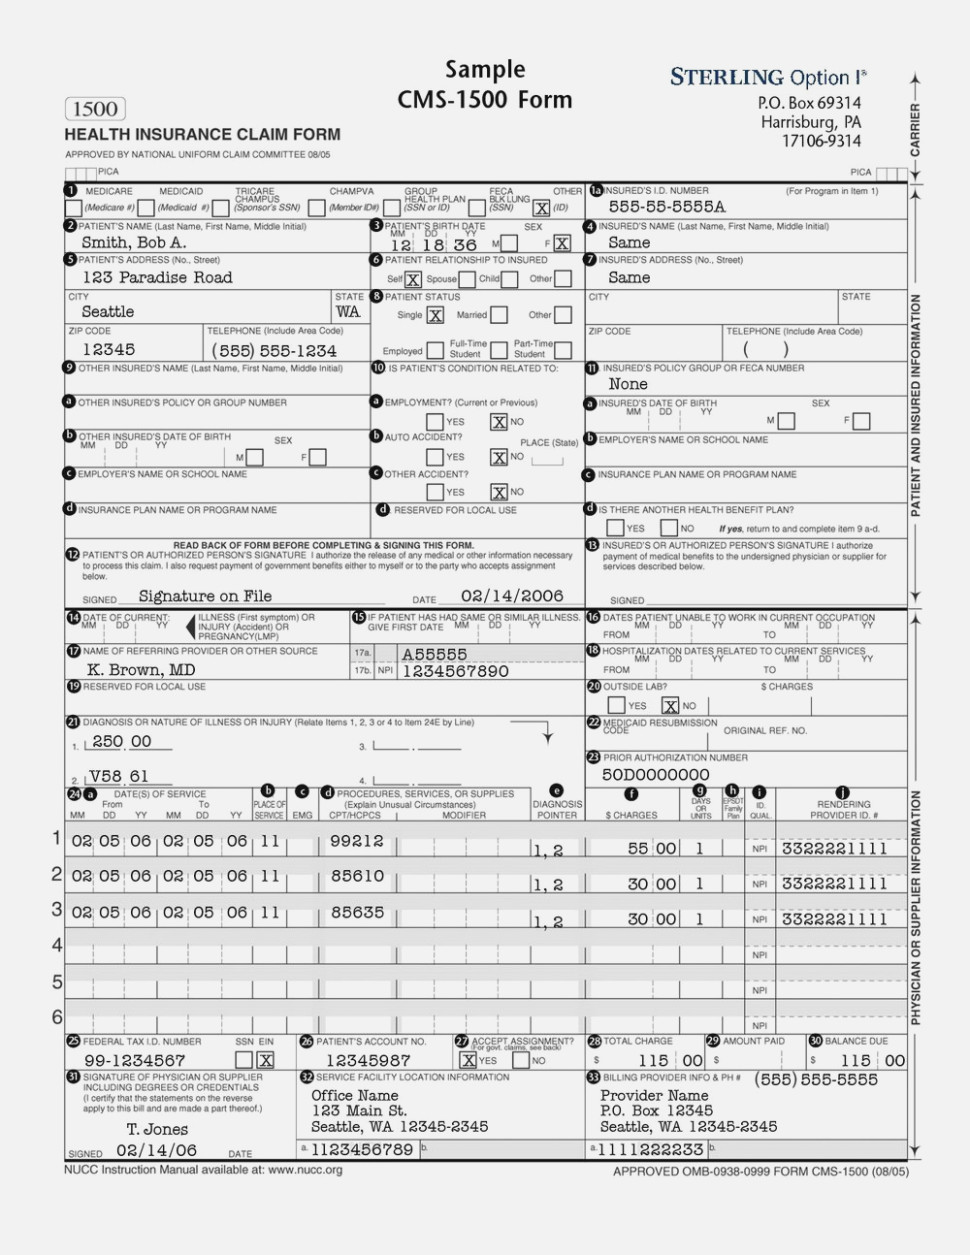 Hcfa Cms 1500 Claim Form